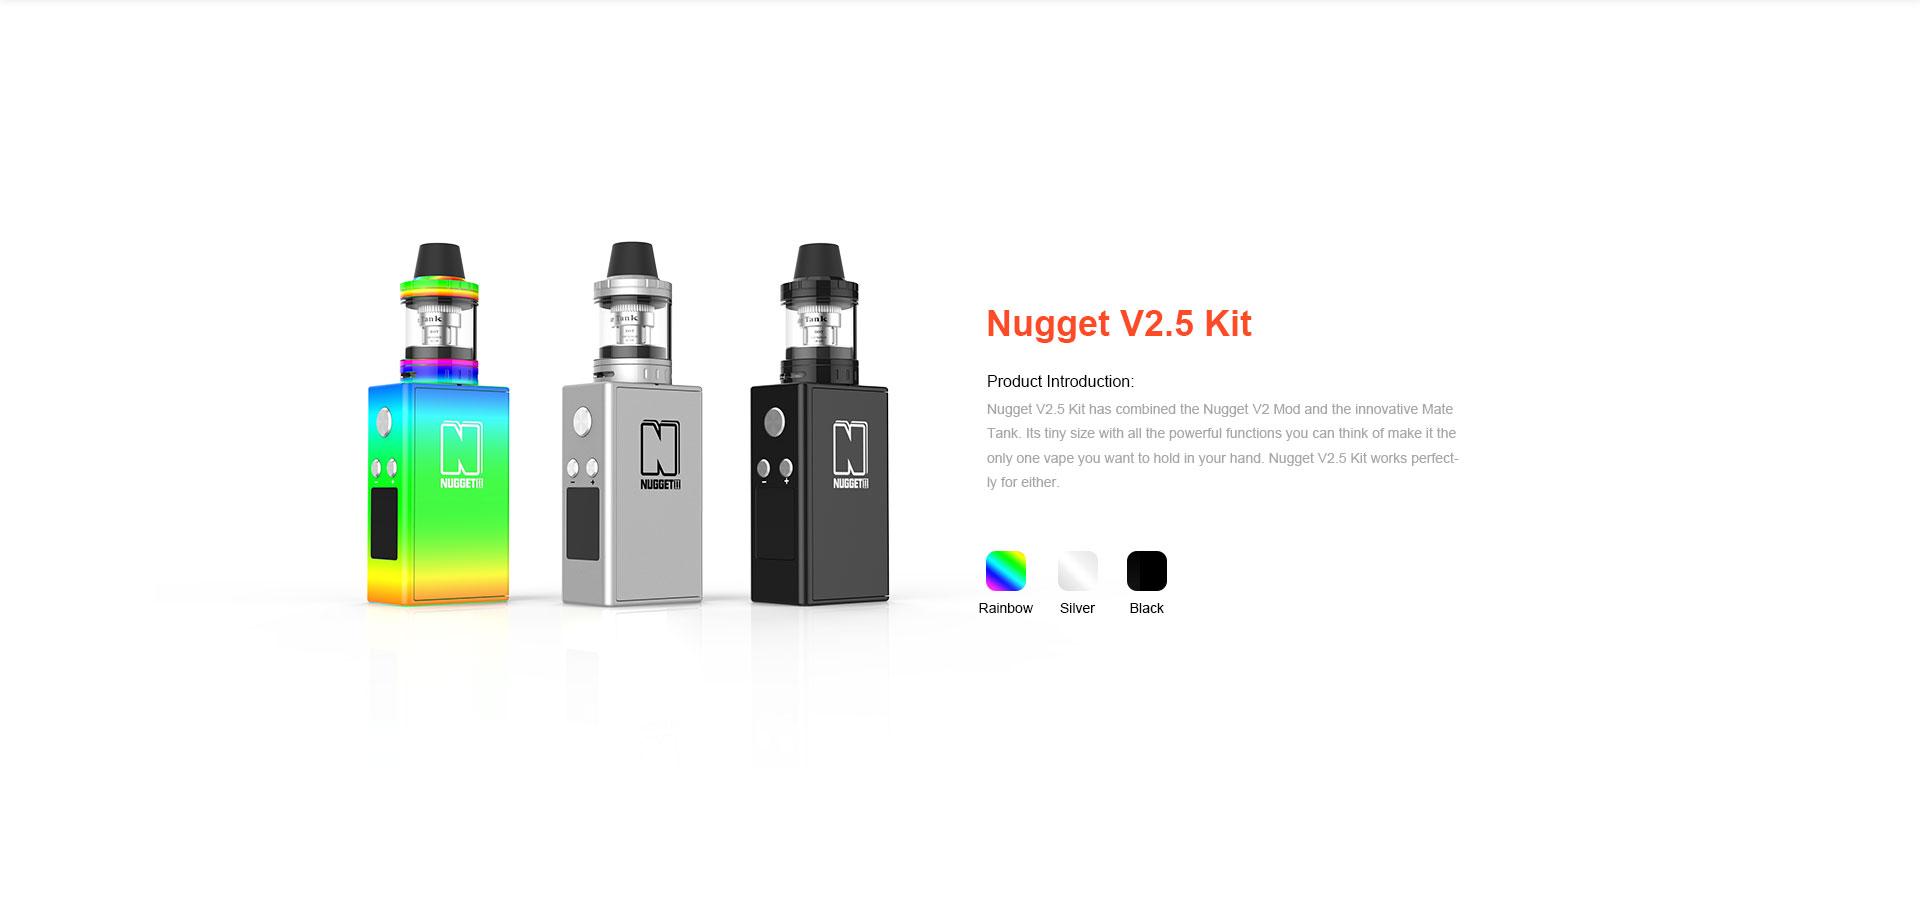 nugget-v2-5-kit_02